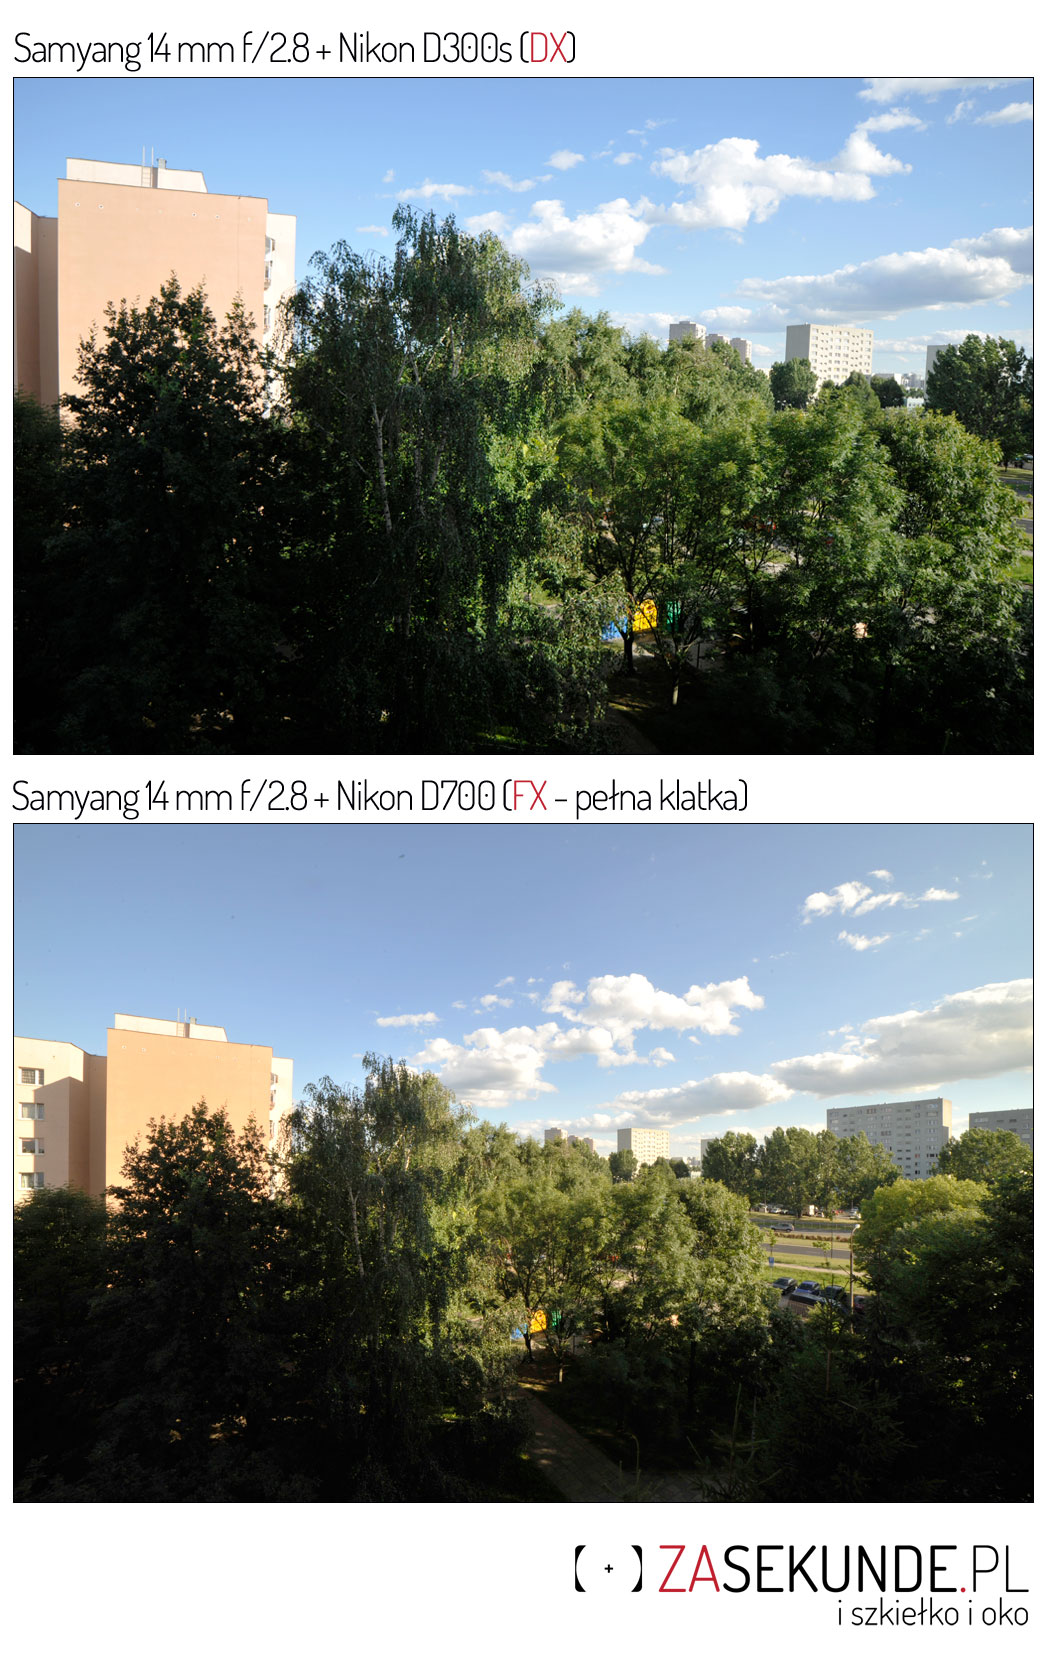 Classy Fx Kontra Dx Fx Kontra Dx Test Na Mm Fotograf Warszawa Fx Vs Dx Which Is Better Fx Vs Dx Nikon Lens dpreview Fx Vs Dx